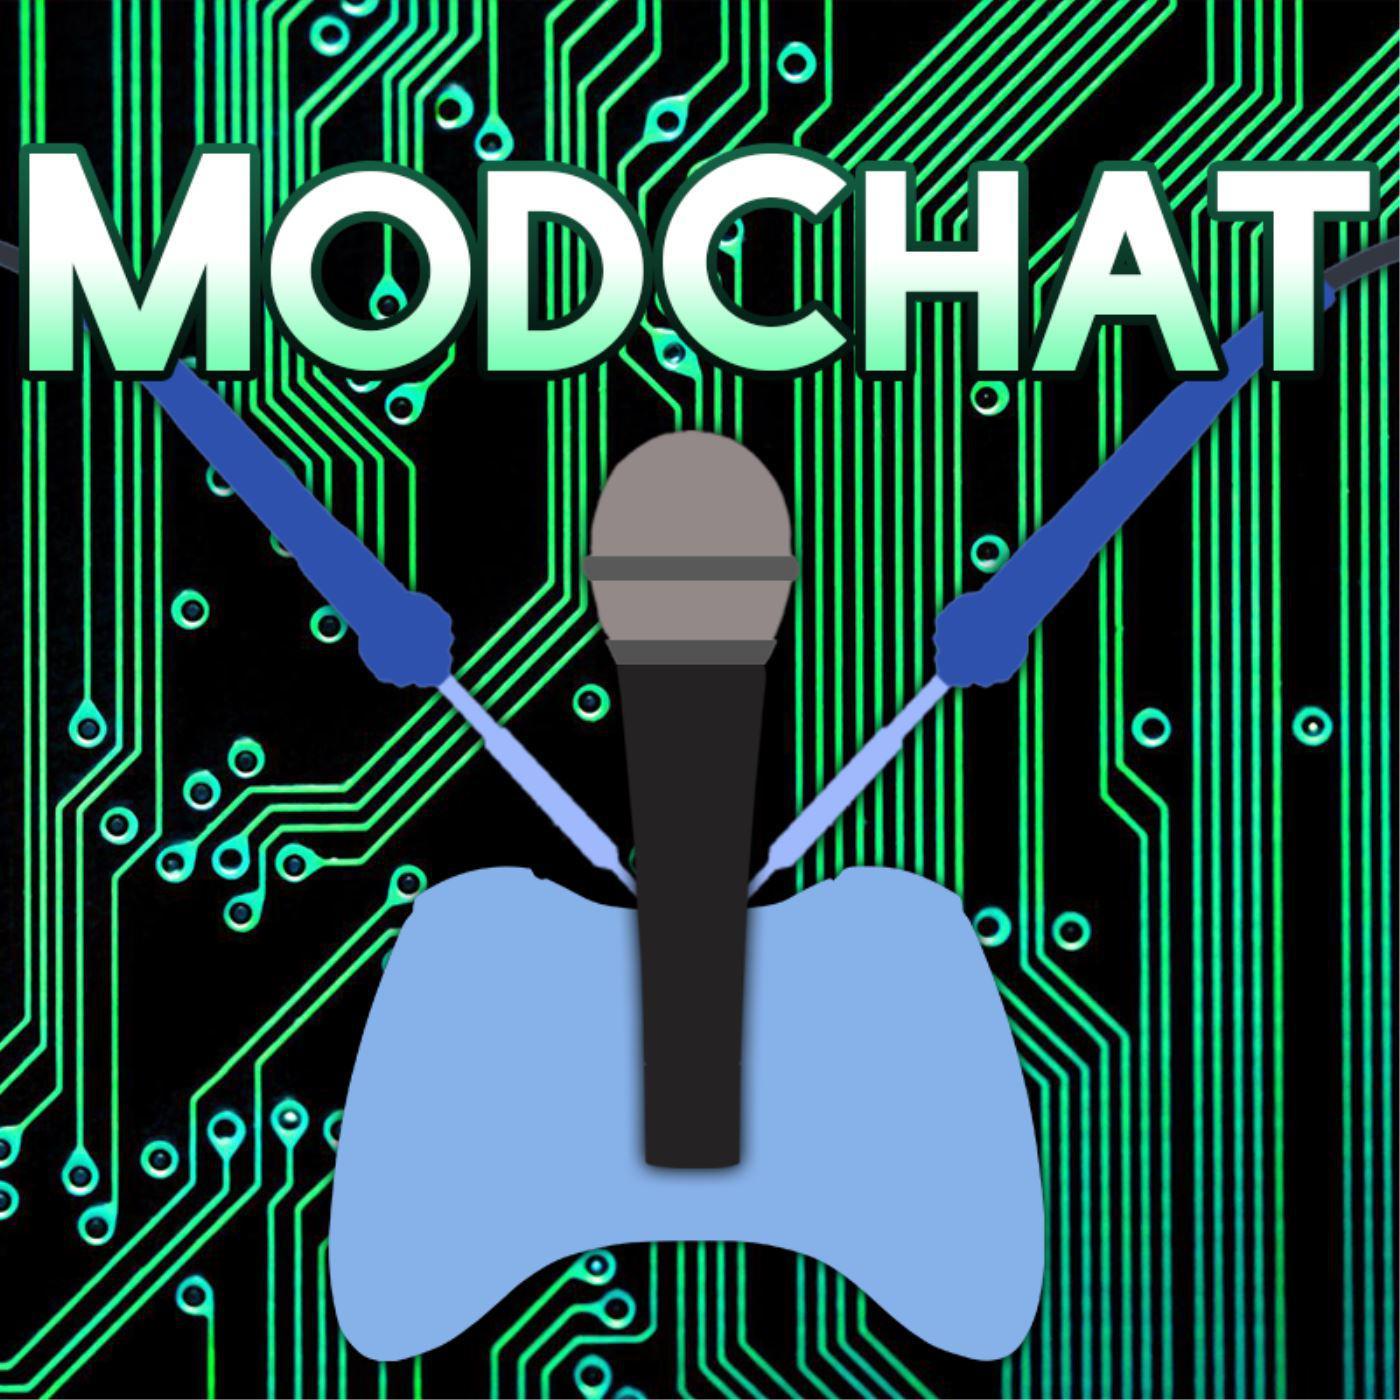 ModChat 042 - Switch Bans, SX Brick Code Removed, h-encore